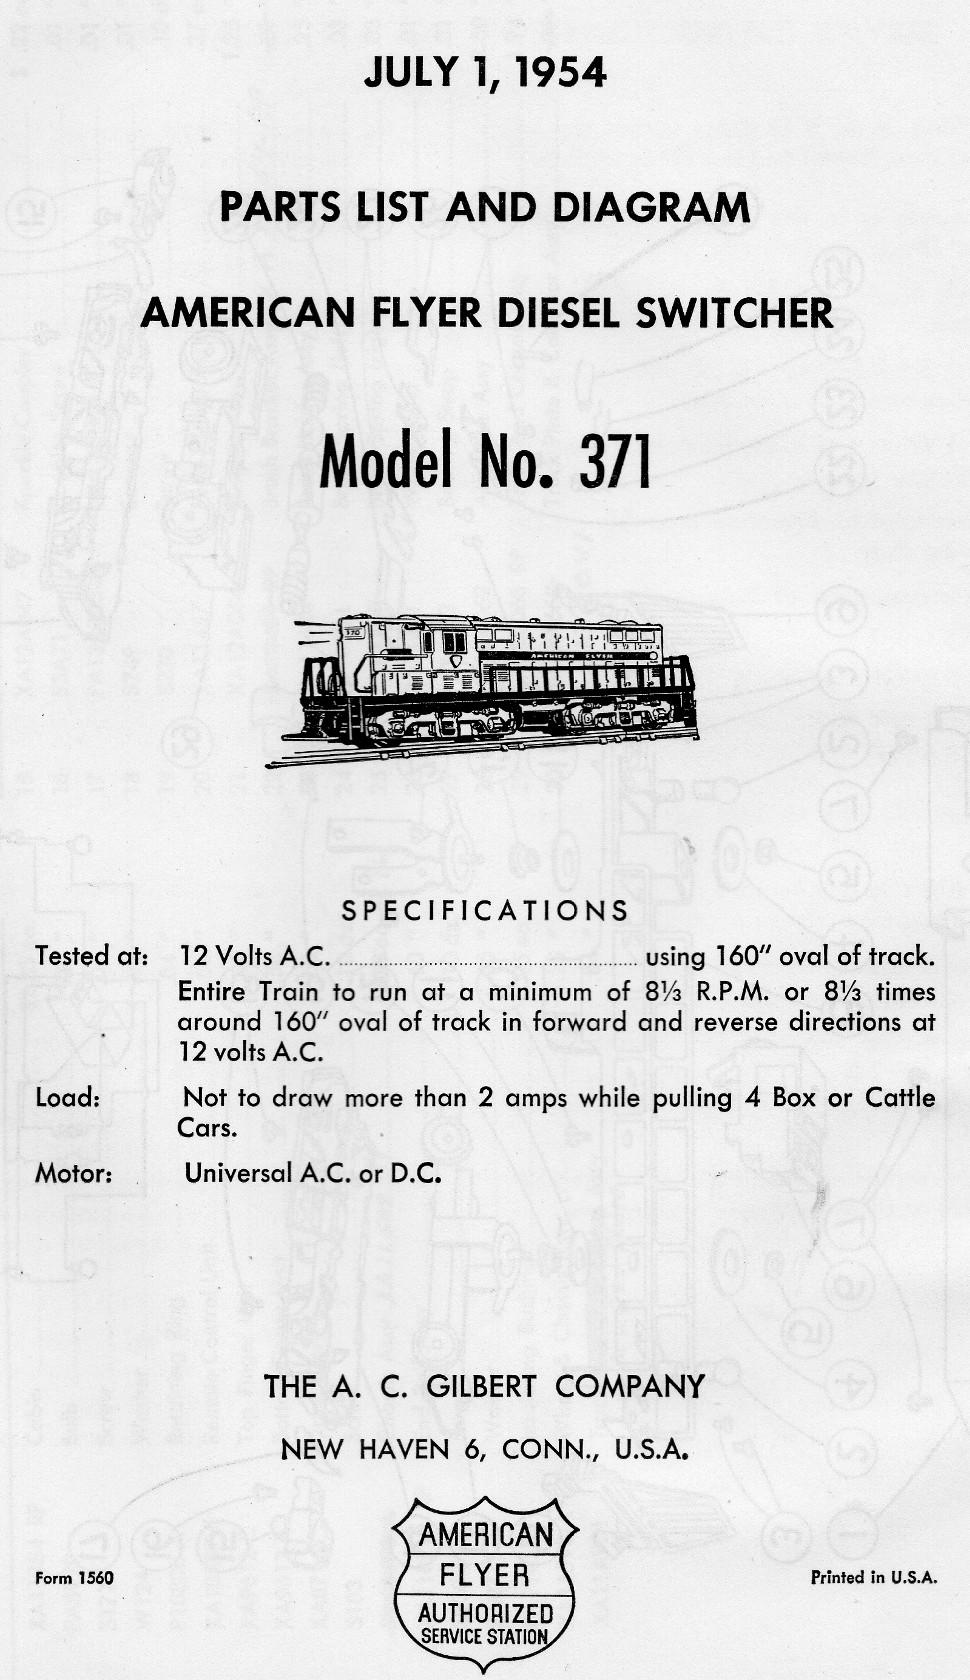 American Flyer Diesel Switcher No. 371 Parts List & Diagram - Page 1